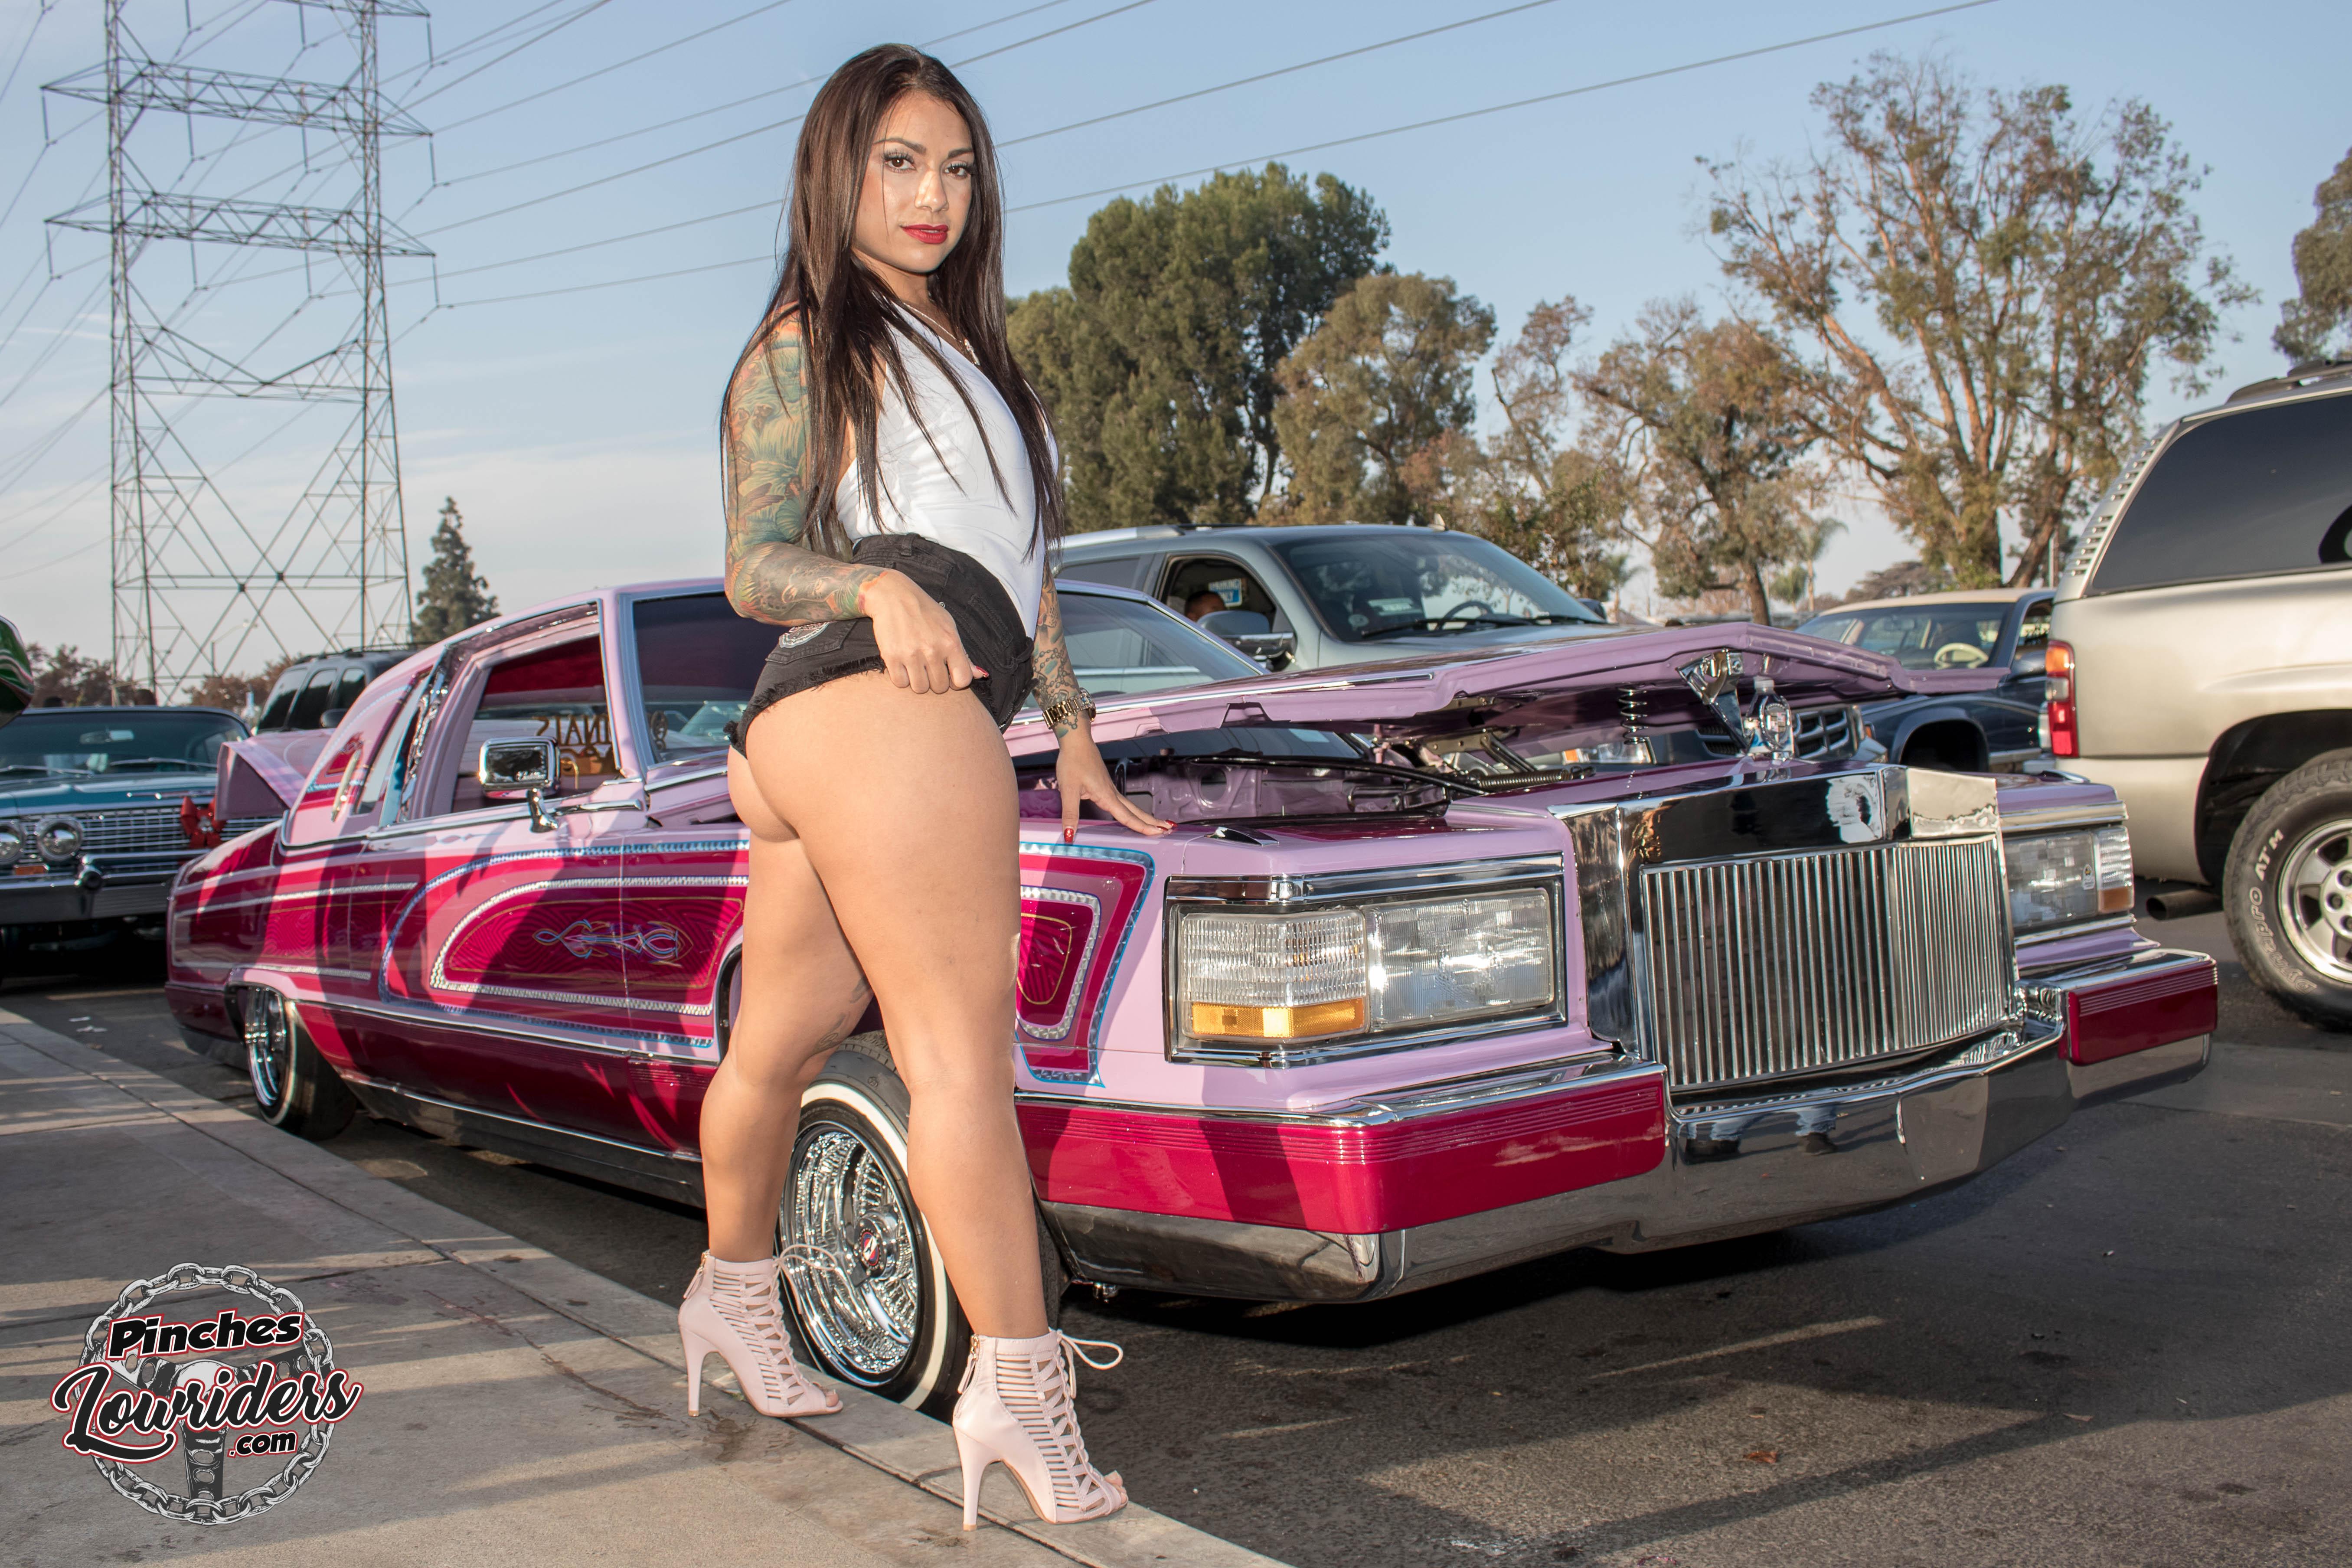 Lowrider car show girls nude